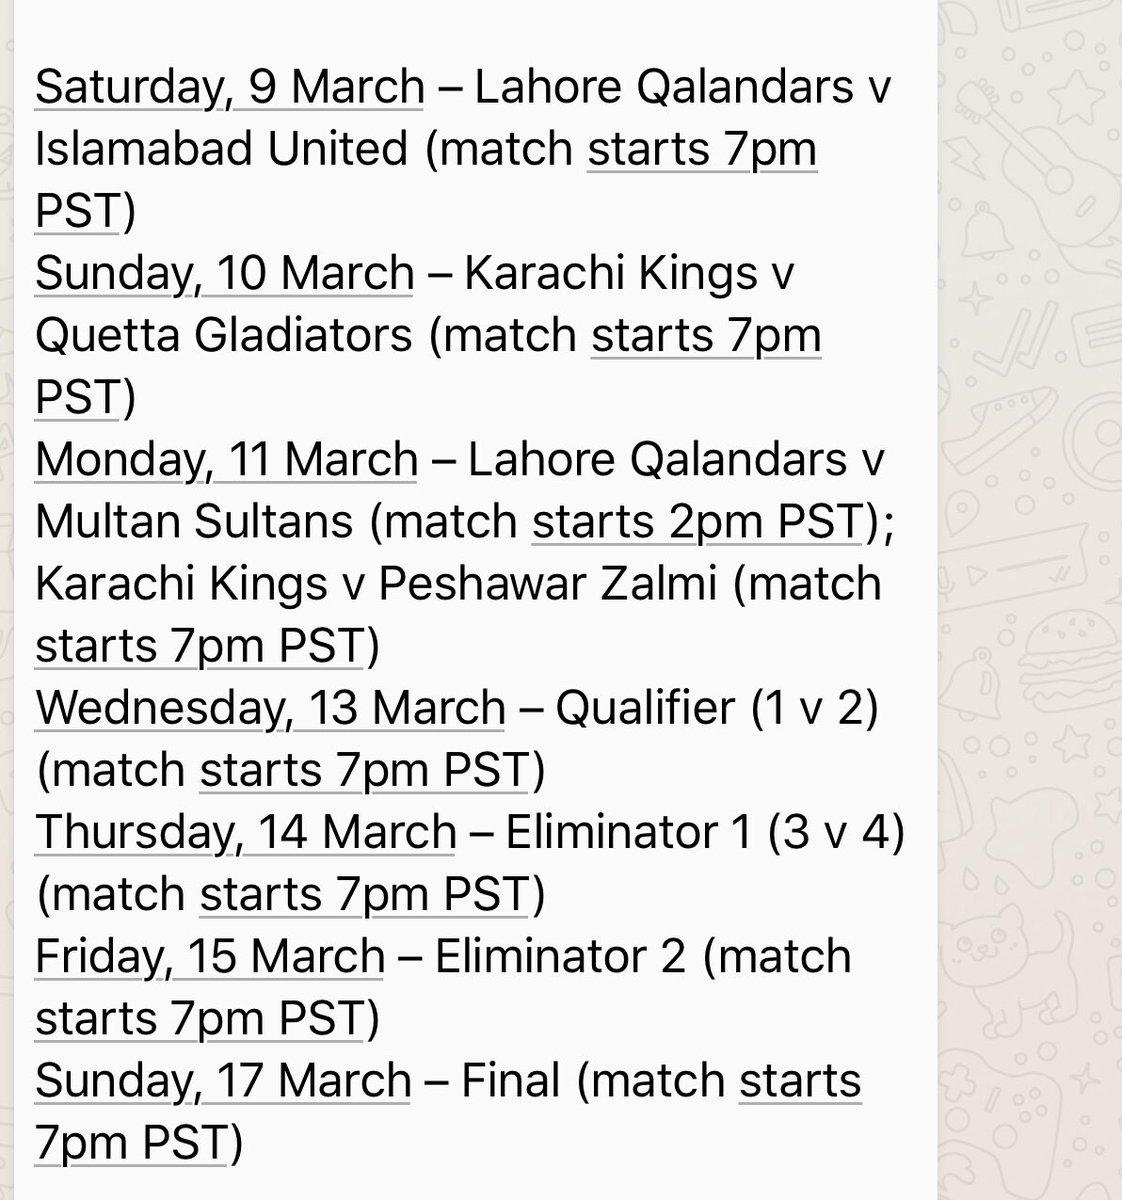 Pakistan Super League last 8 matches will be played in National Stadium, Karachi. #HBLPSL #HBLPSL2019 #KhelDeewanoKa https://t.co/t73kluGjB3